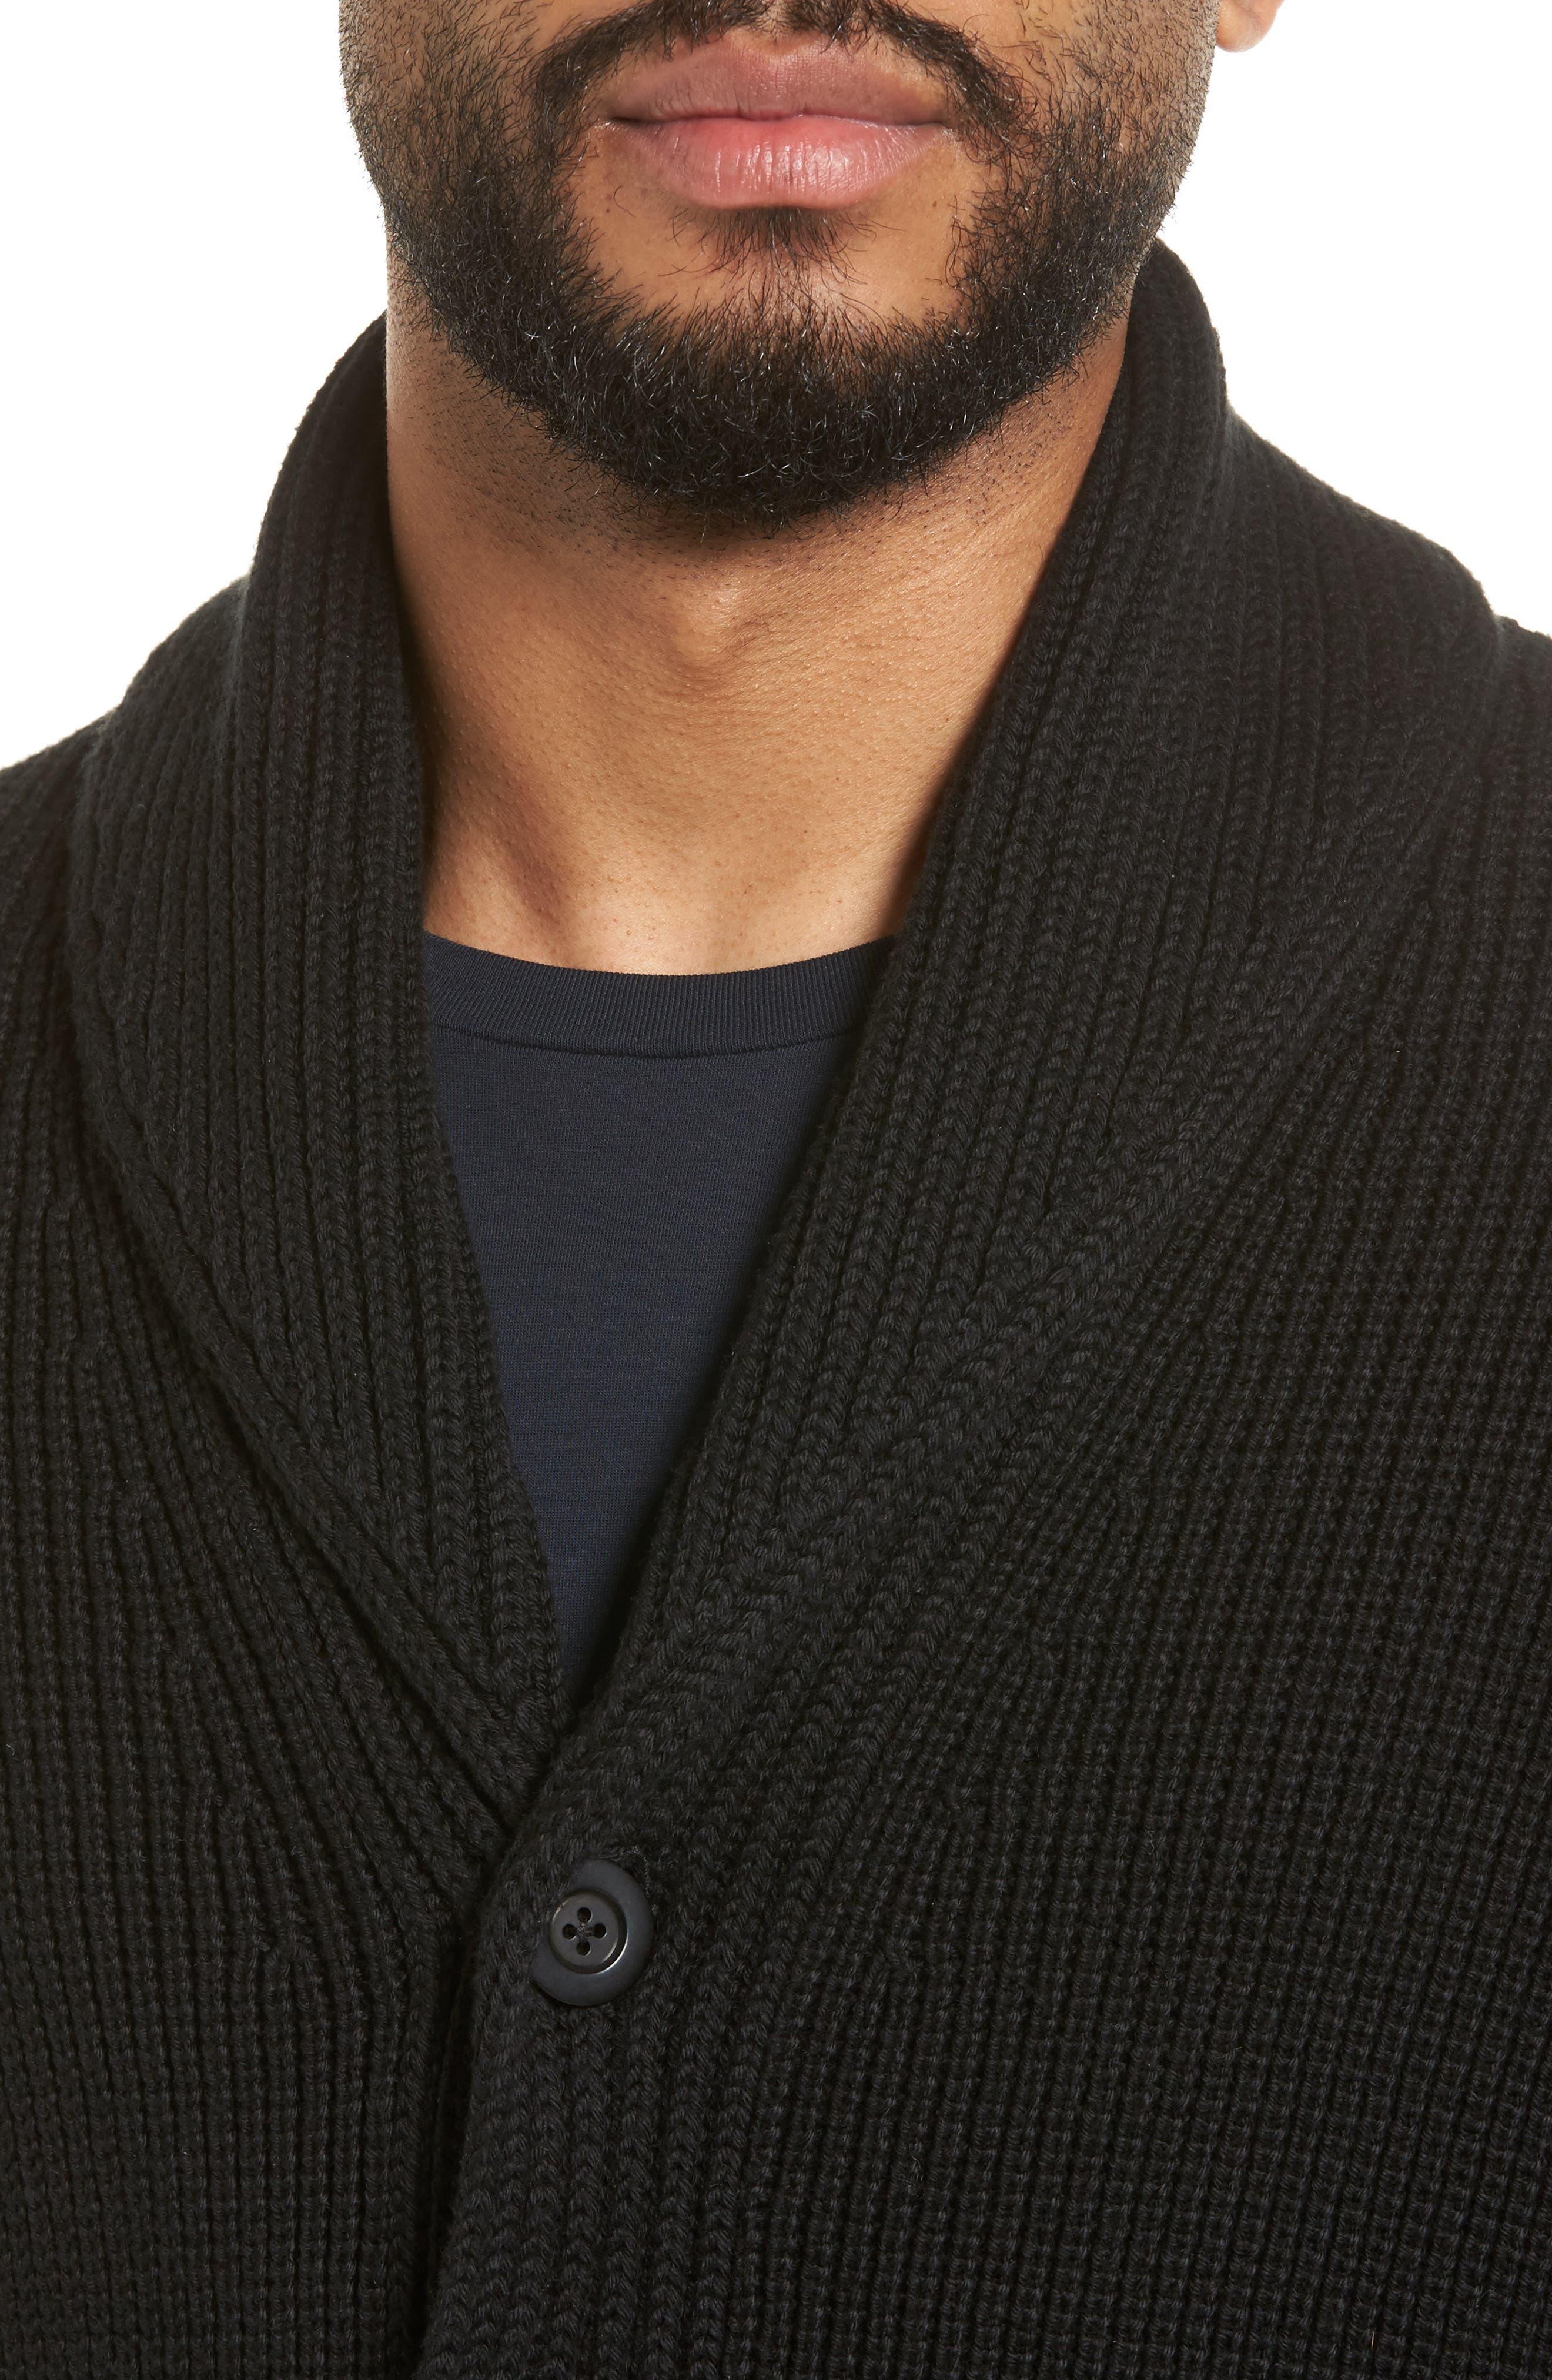 Shawl Collar Cardigan,                             Alternate thumbnail 4, color,                             001